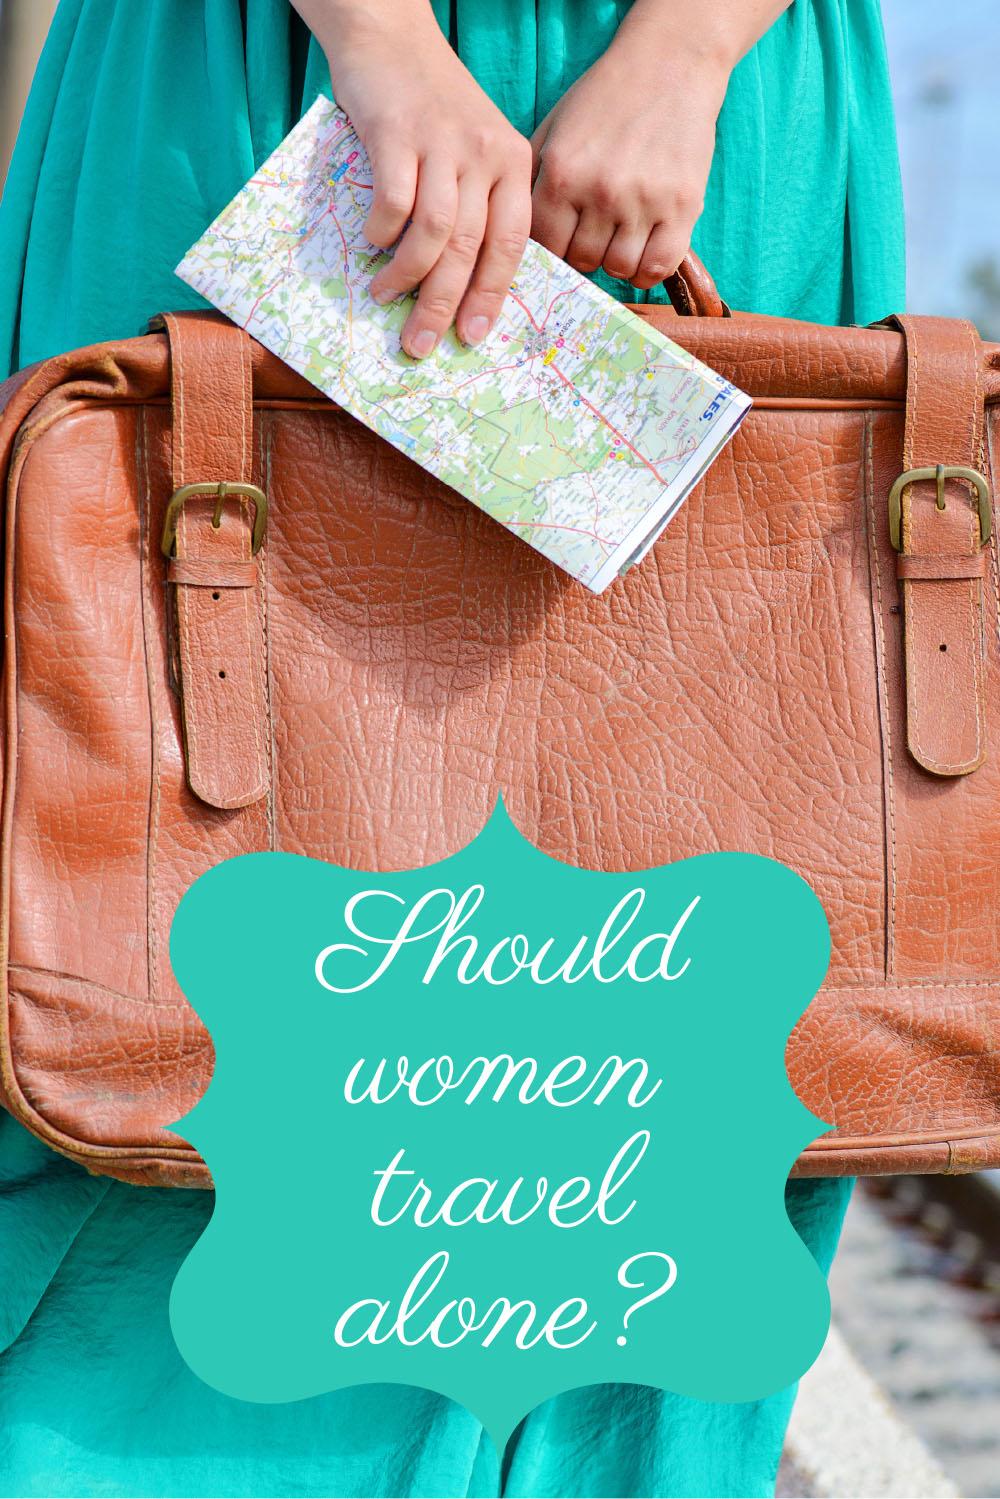 Should women travel alone?